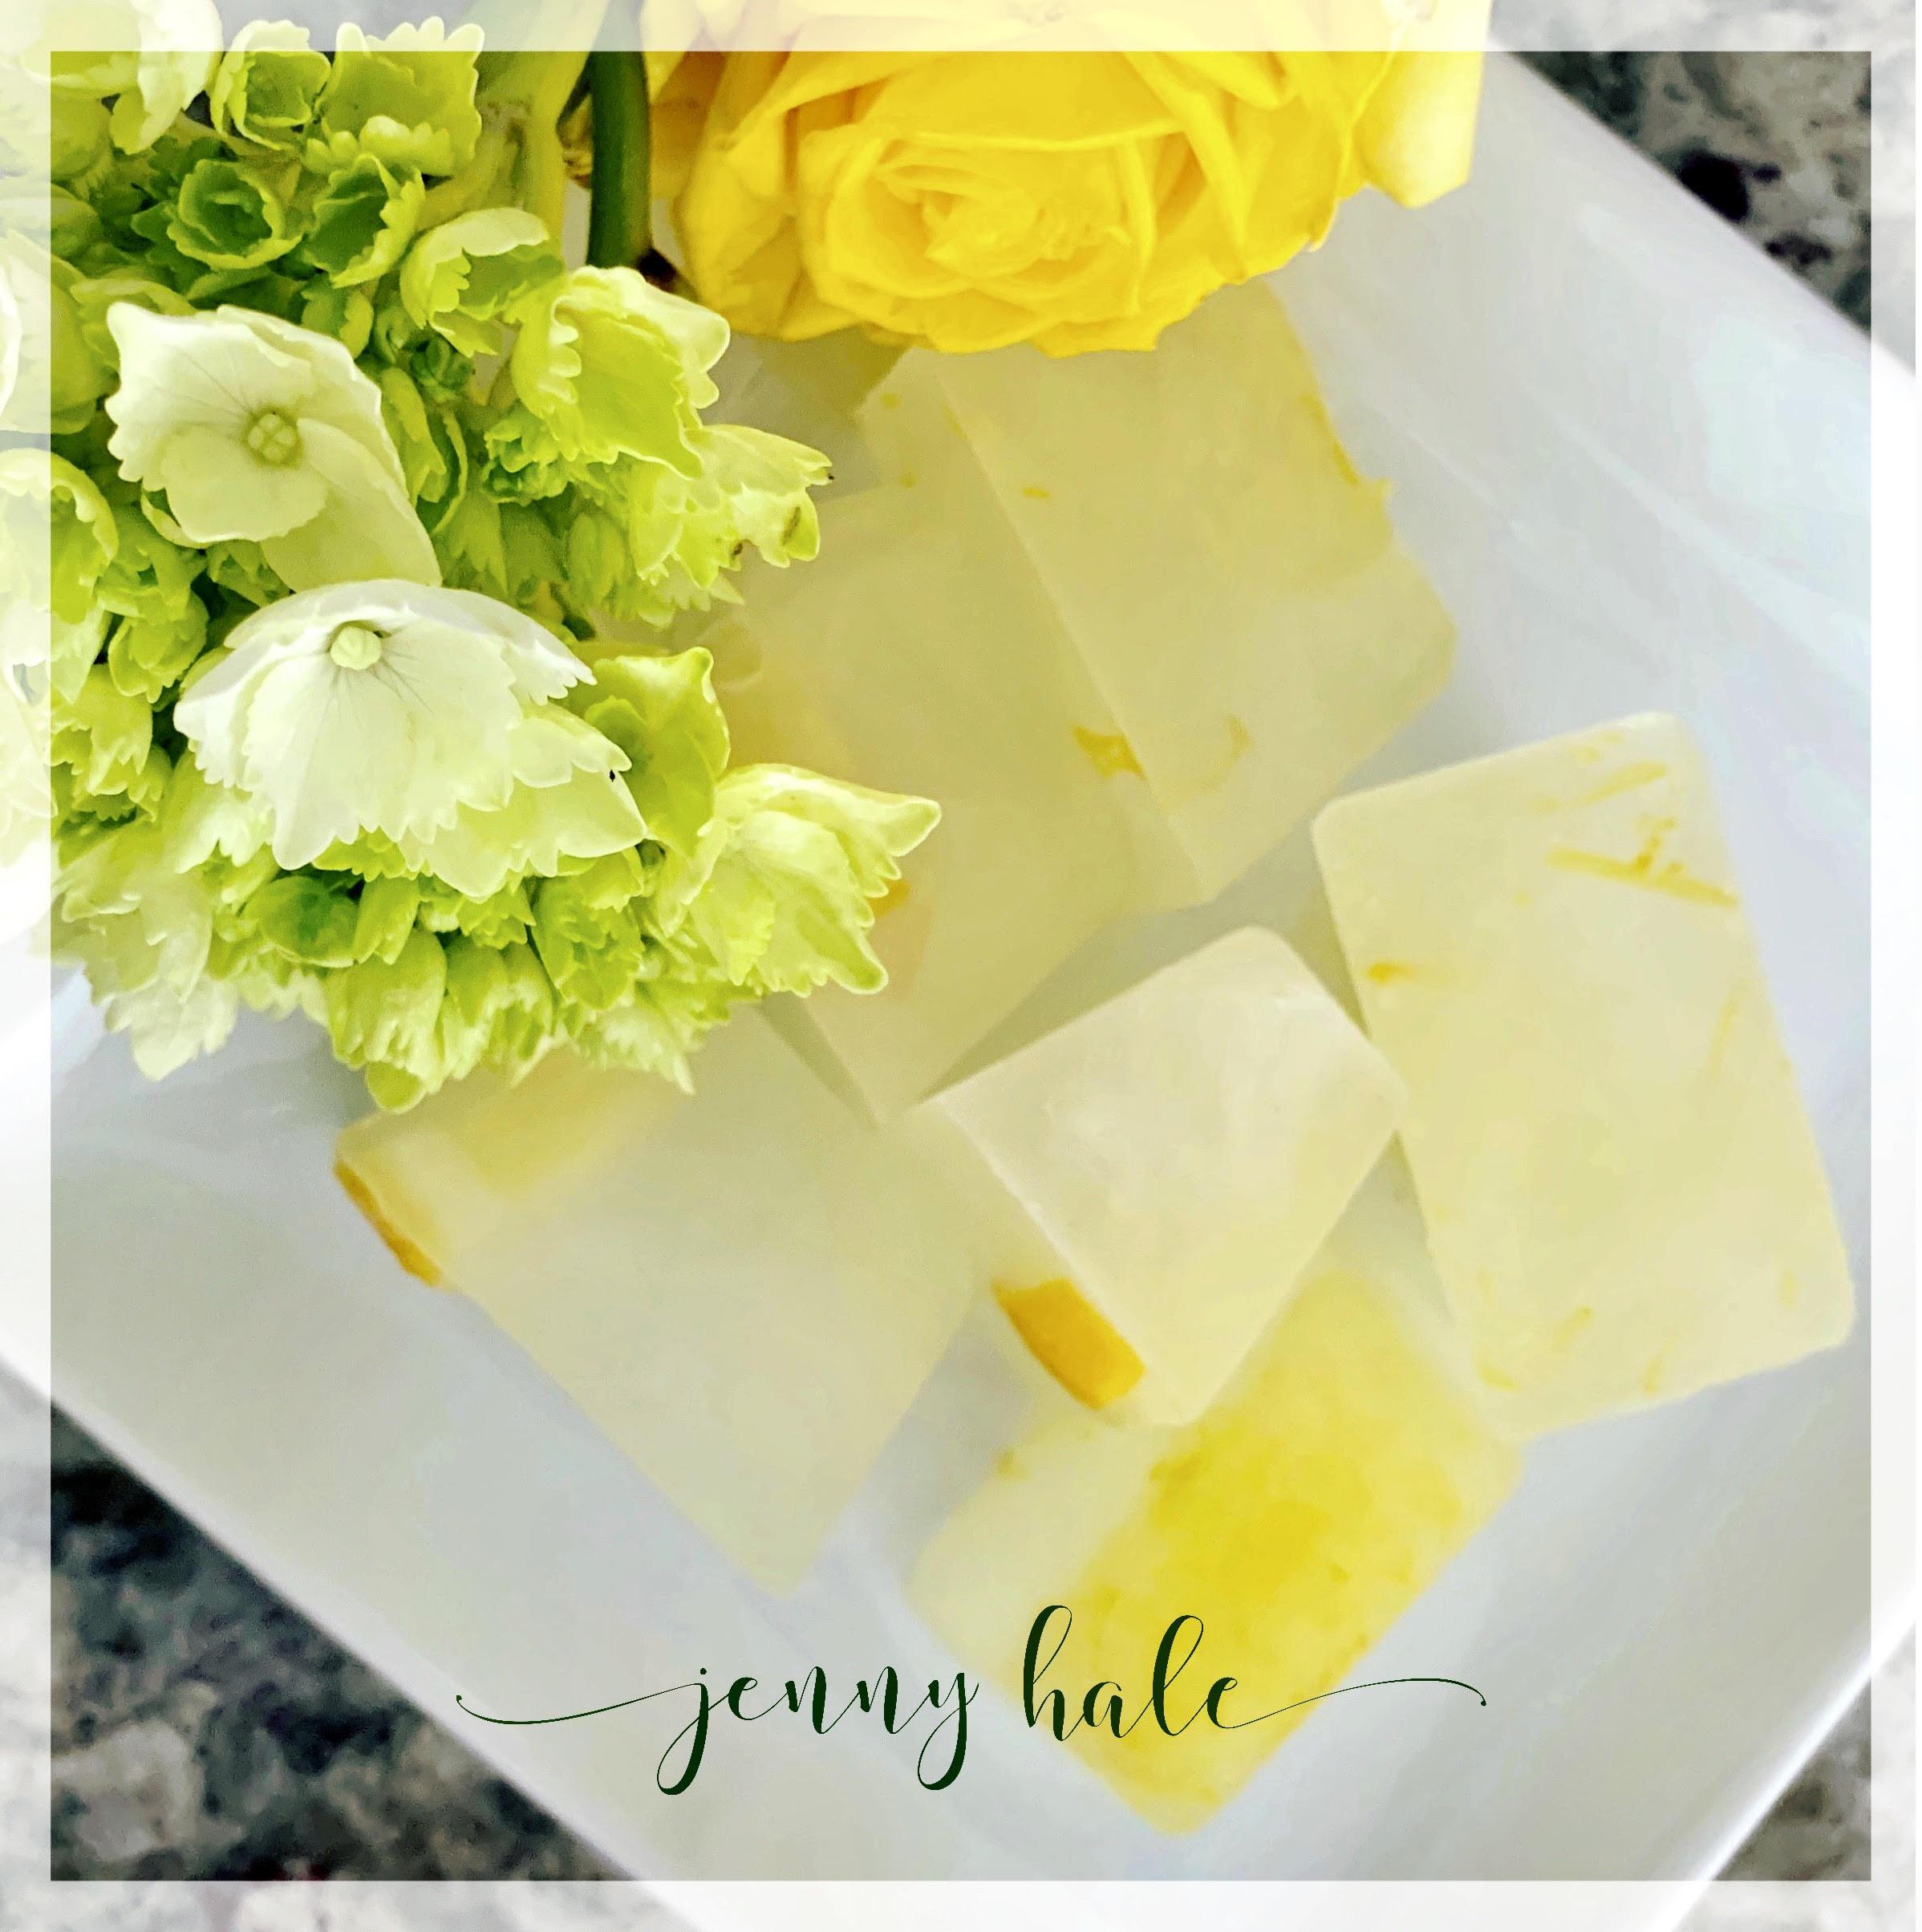 Lemonade ice cubes with lemon slices and zest jazz up even the fanciest lemonade!